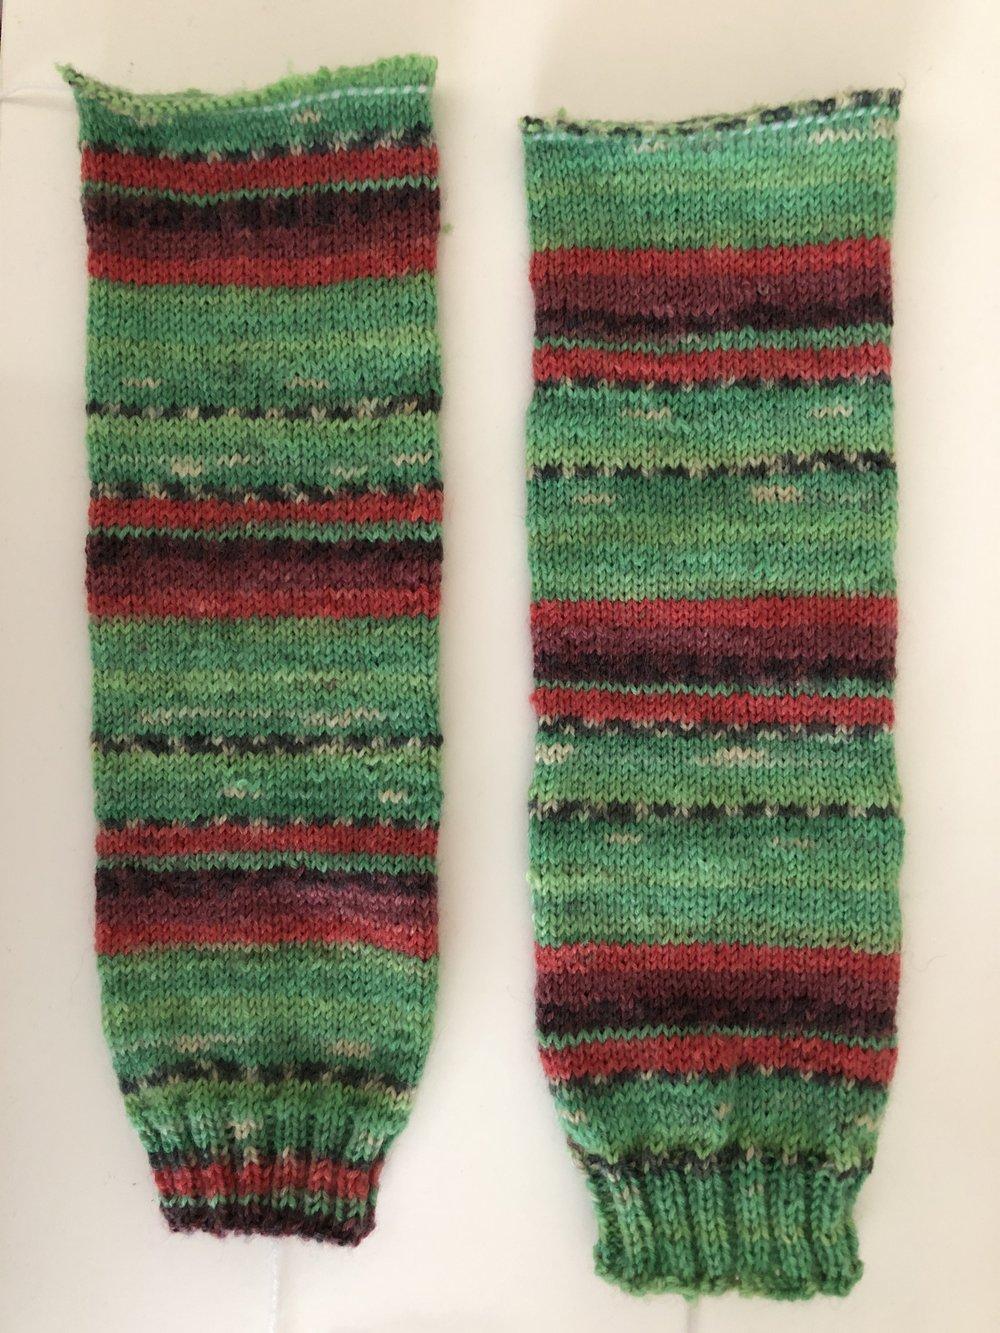 Step two - Ta dah two socks :-)